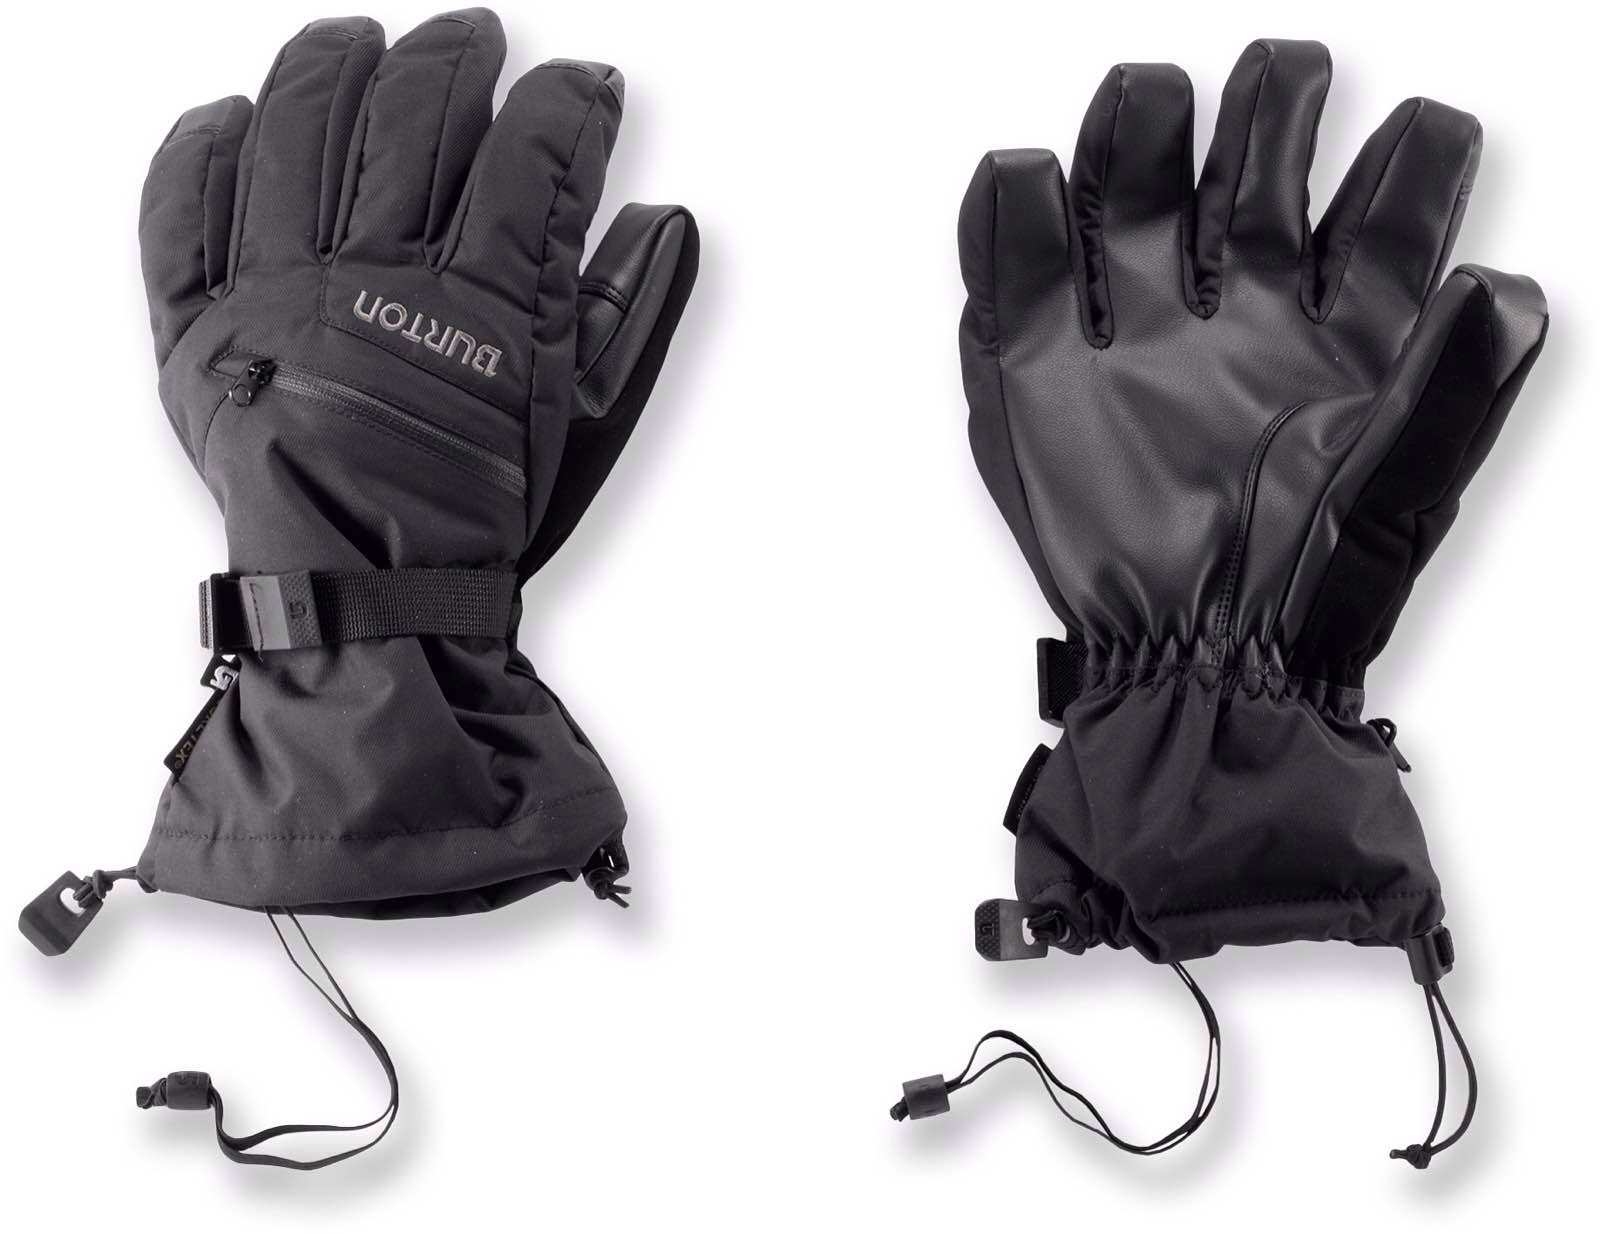 Burton GORE-TEX Gloves. ($49–$70, depending on size)